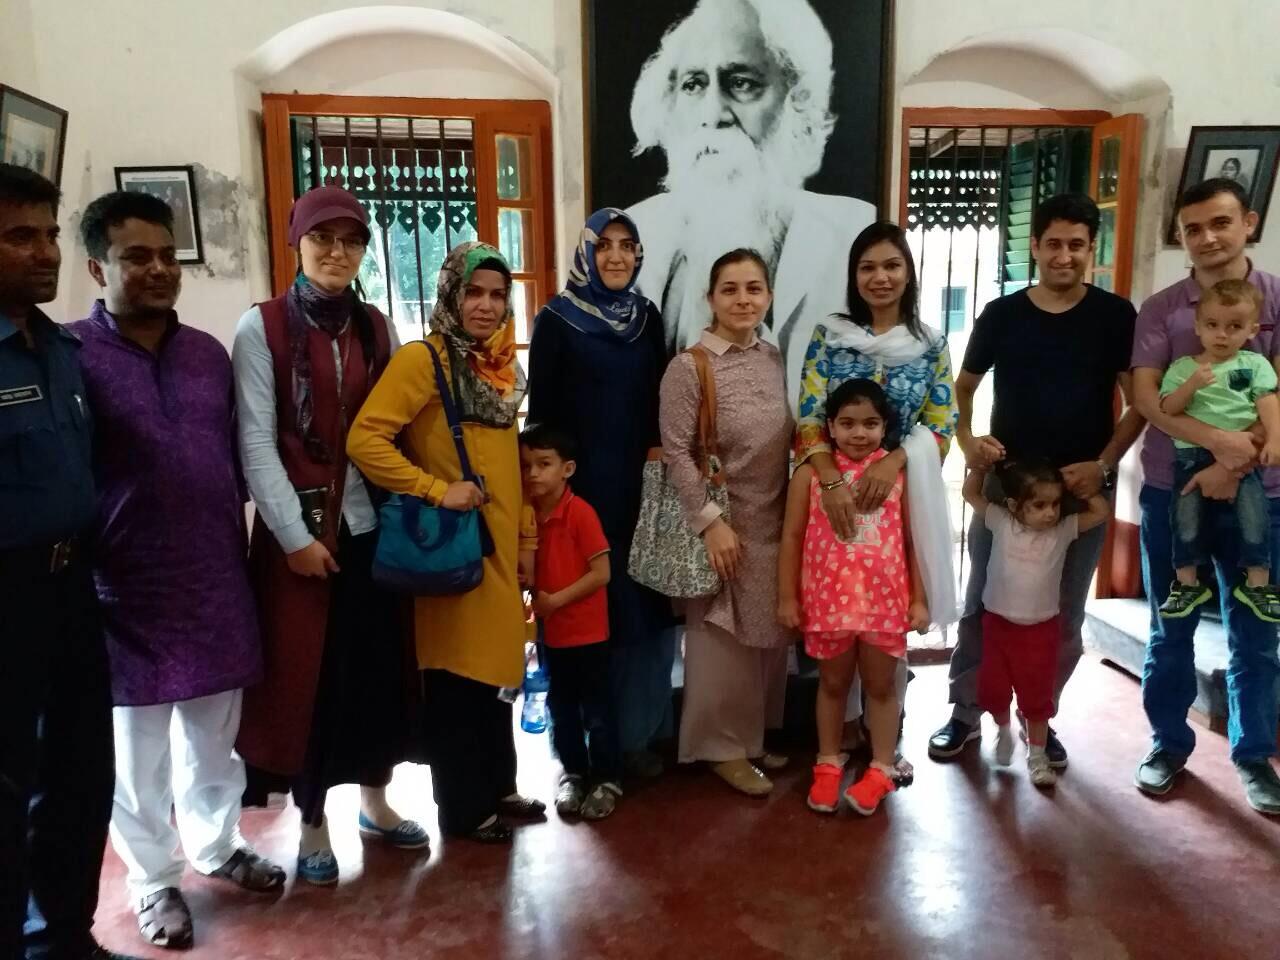 Int'l Turkish Hope School Senior Girls Section: VISIT TO